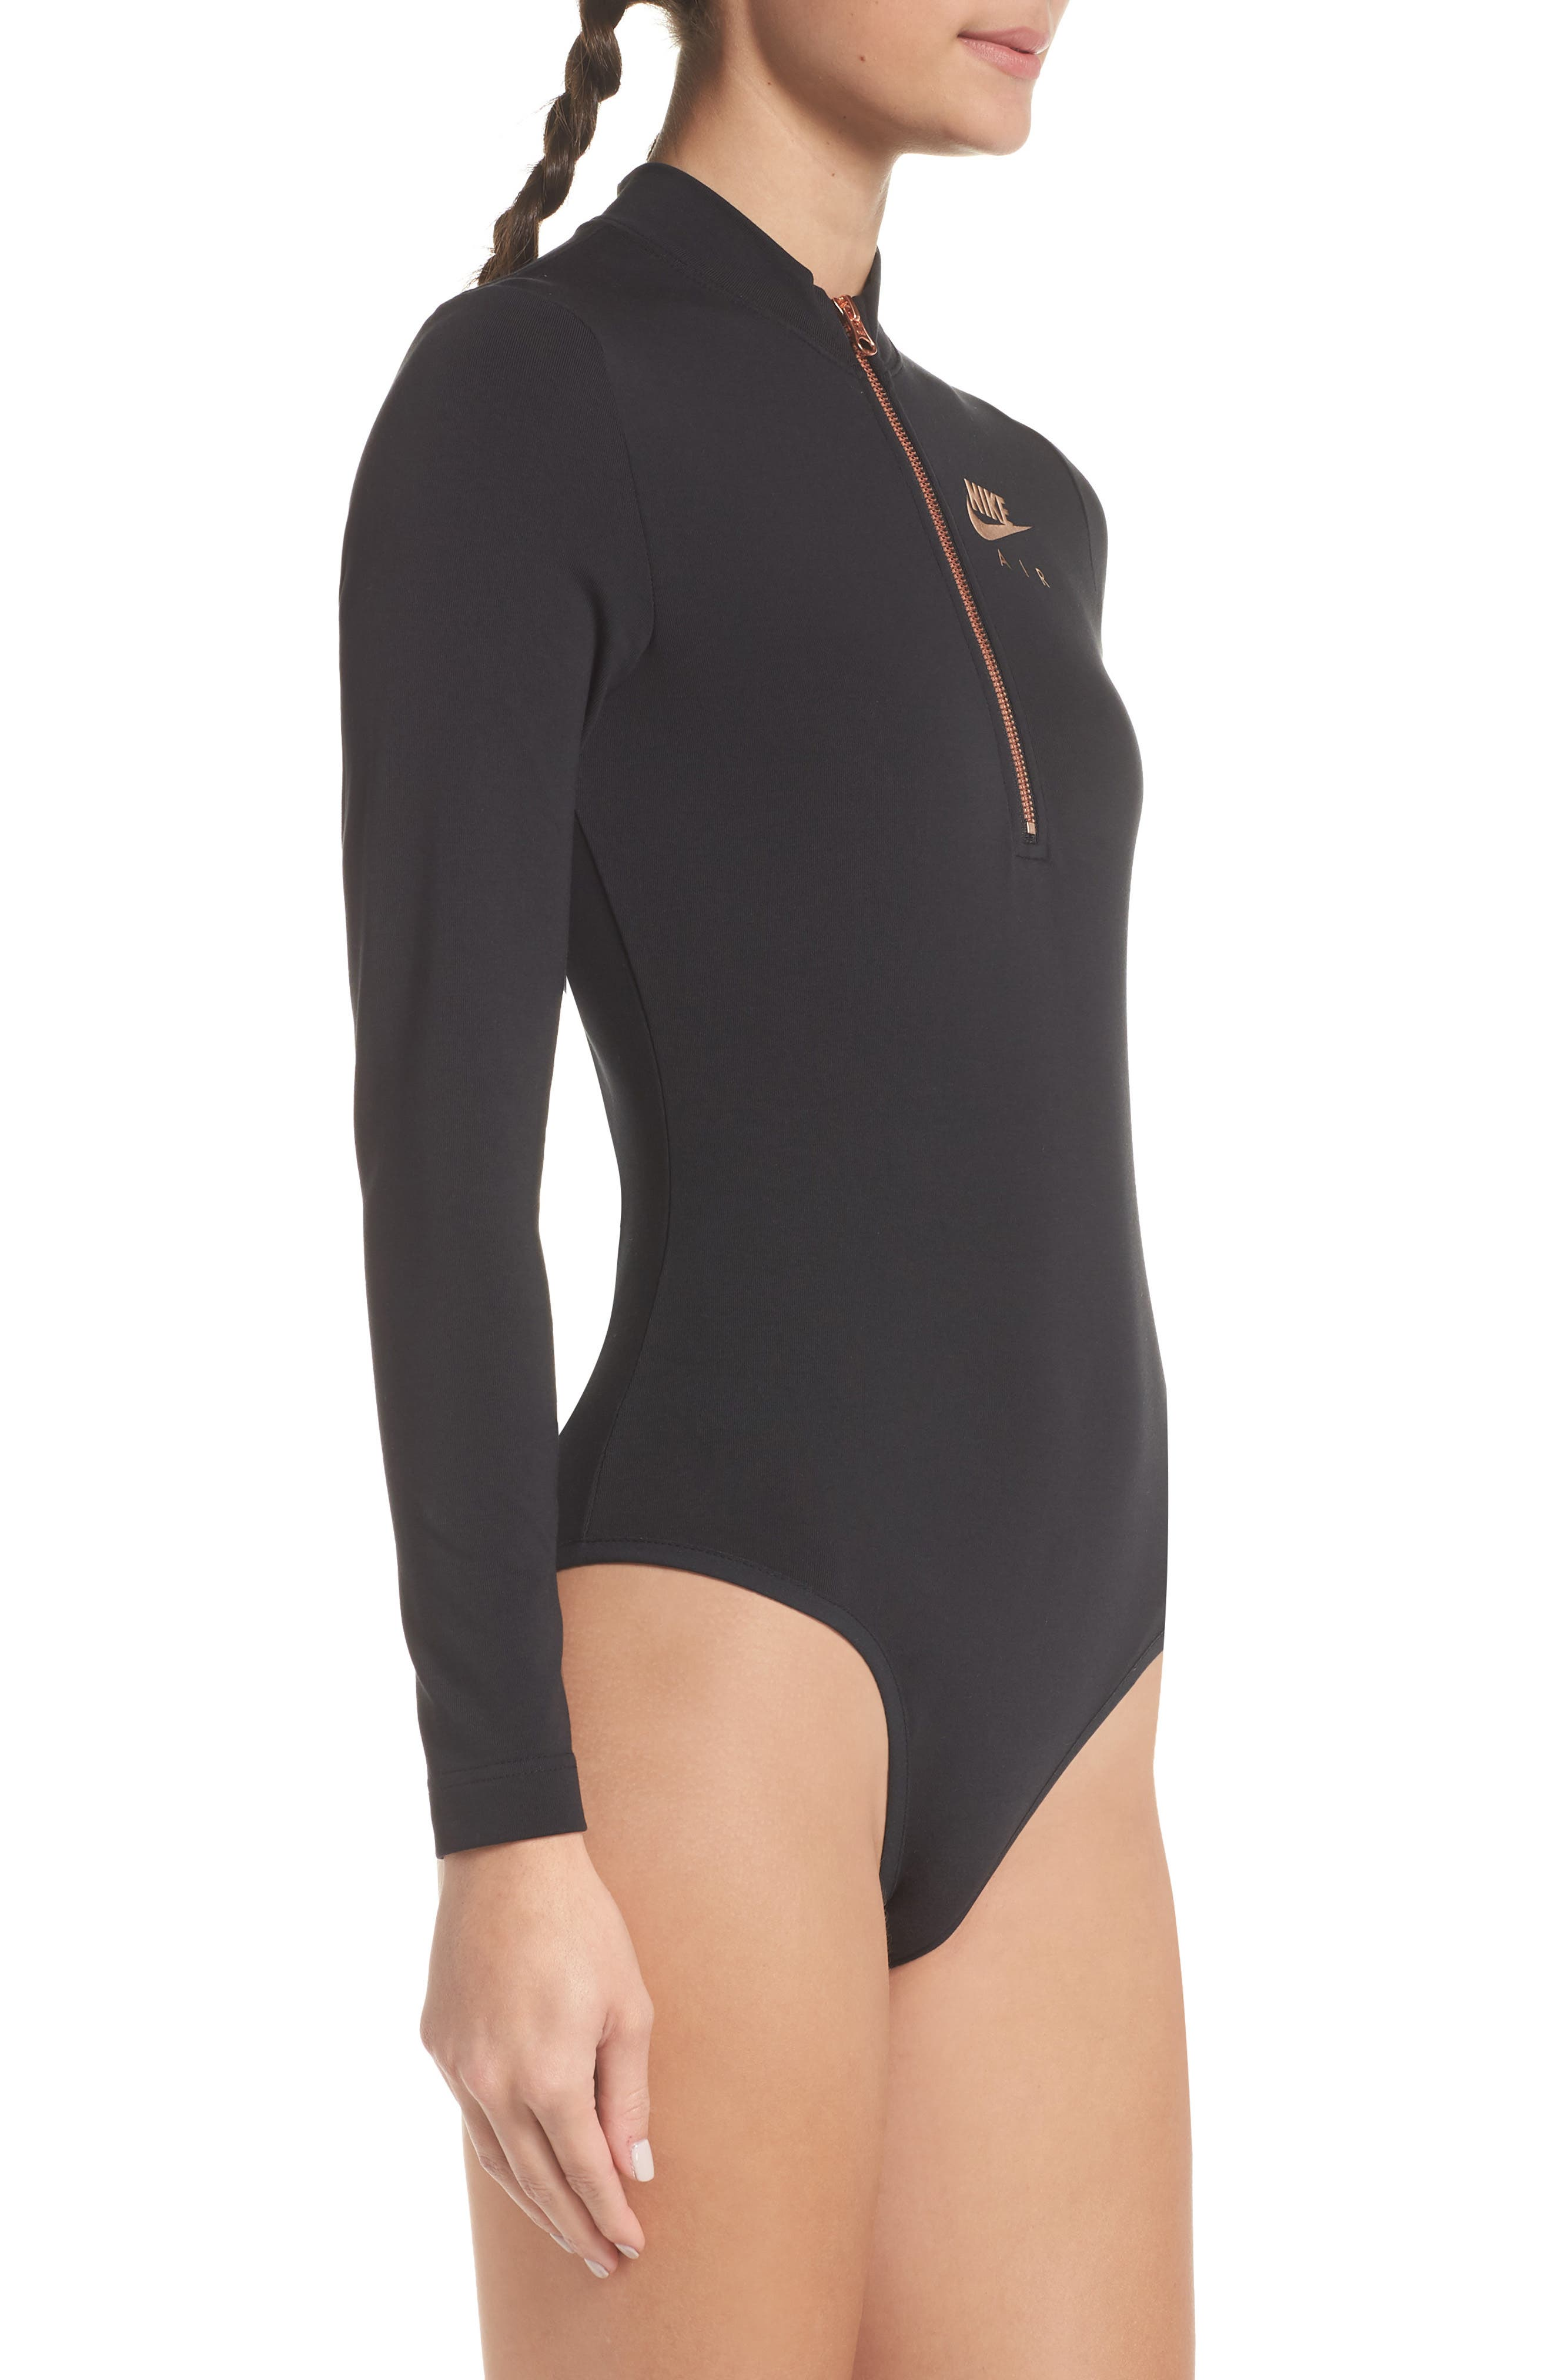 Sportswear Women's Long Sleeve Bodysuit,                             Alternate thumbnail 4, color,                             BLACK/ ROSE GOLD